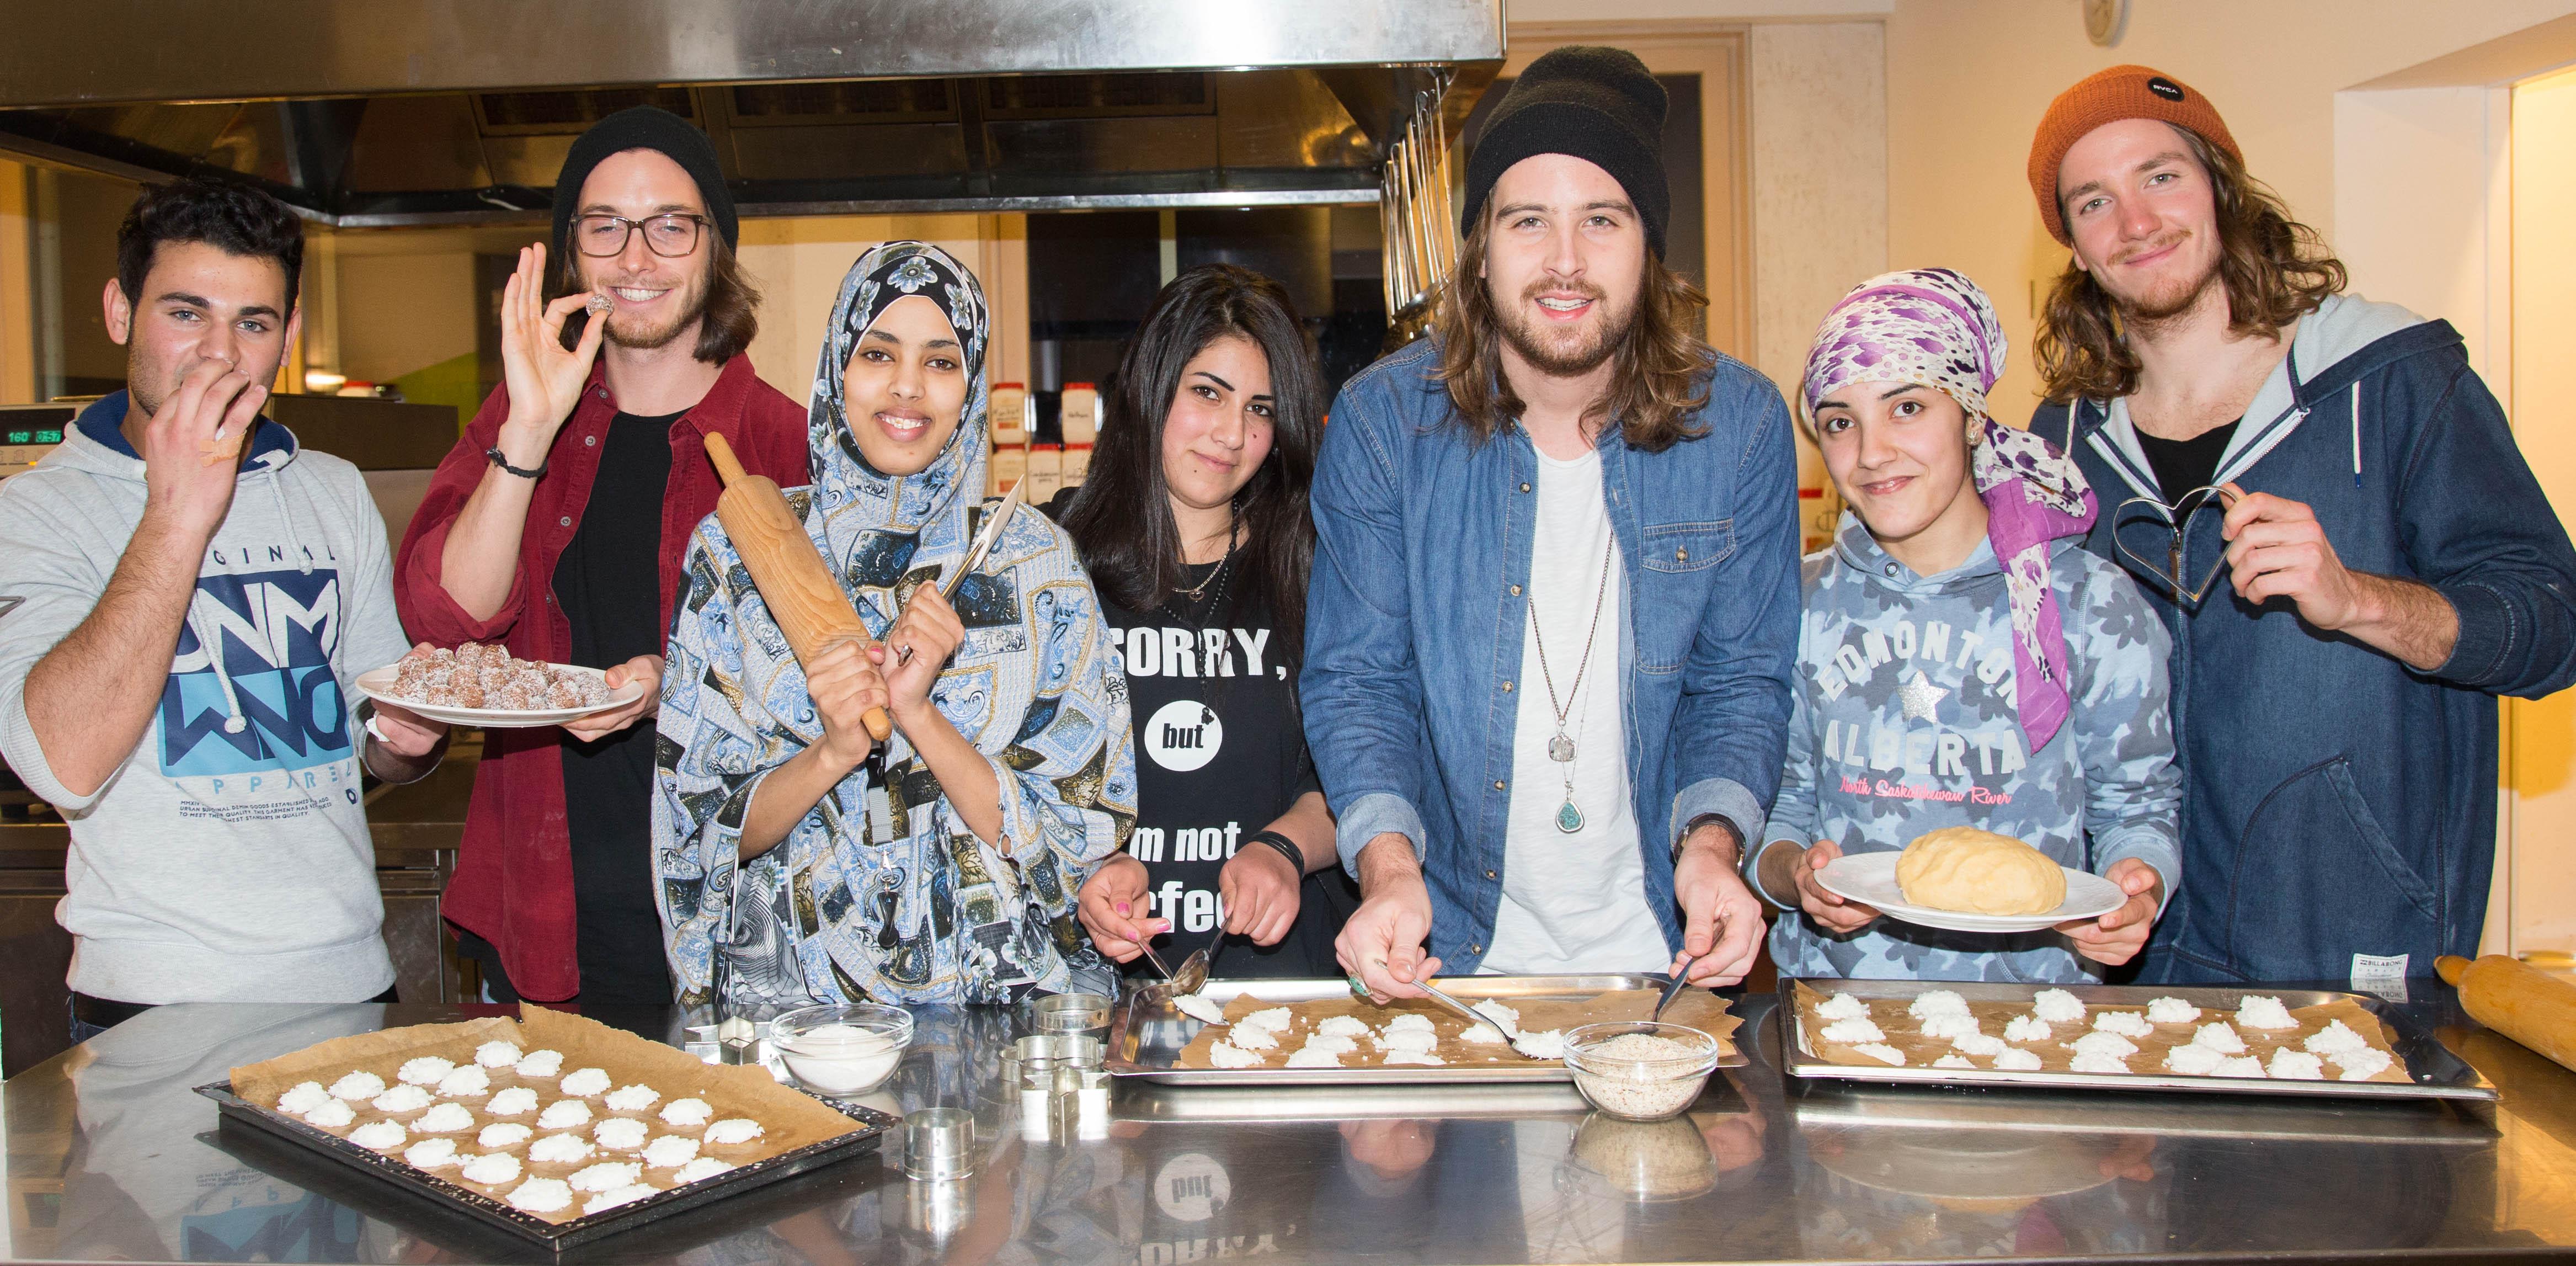 Die Keks-Crew v.l.n.r. Mohamed, Florian Meindl , Awa, Neiven, Dominic  Muhrer, Jilan und Markus Christ. (Foto: Mike Vogl)